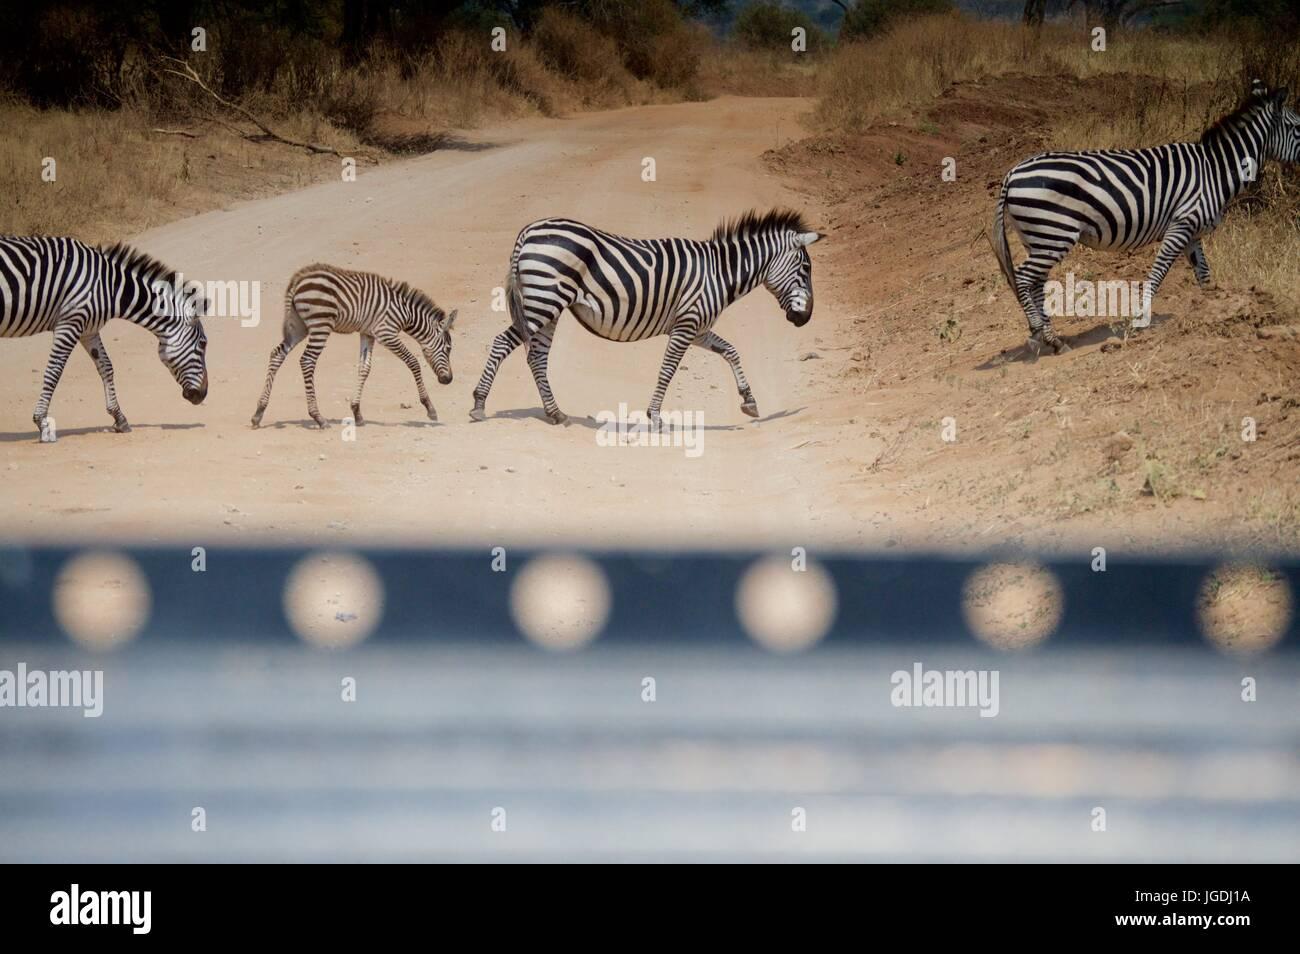 Zebras crossing behind a safari truck, Tanzania - Stock Image